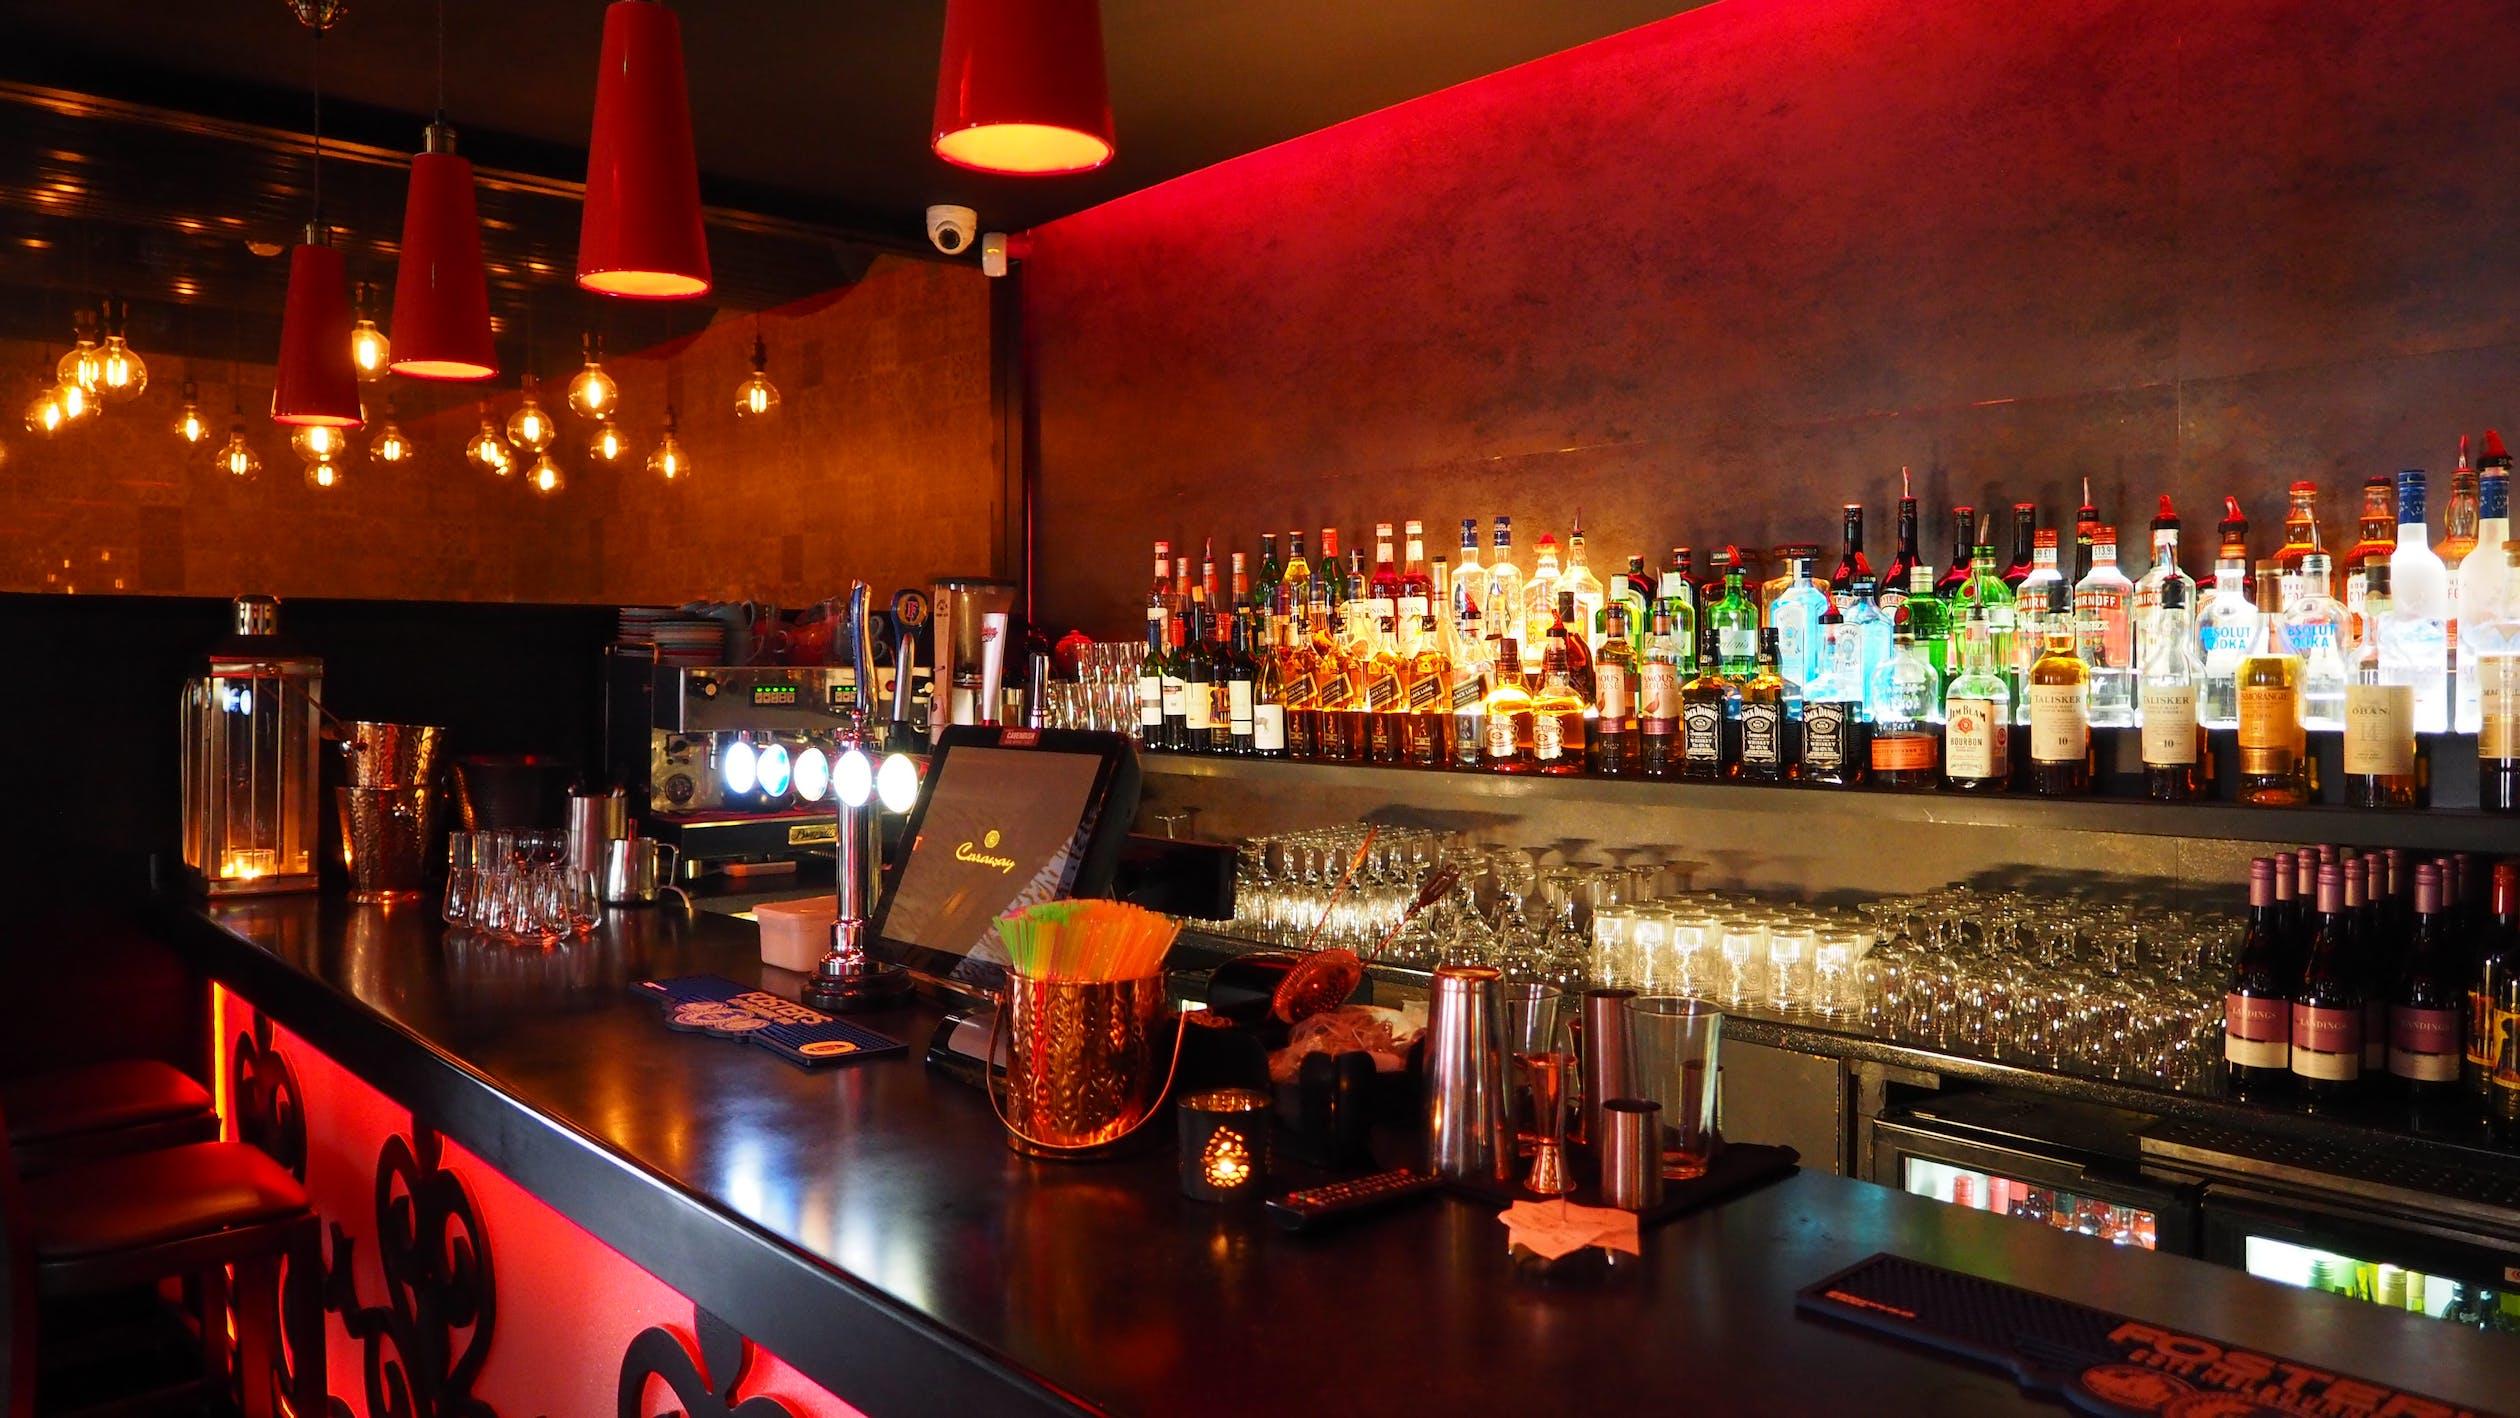 Curfew extended to midnight for bars, restaurants beginning April 19